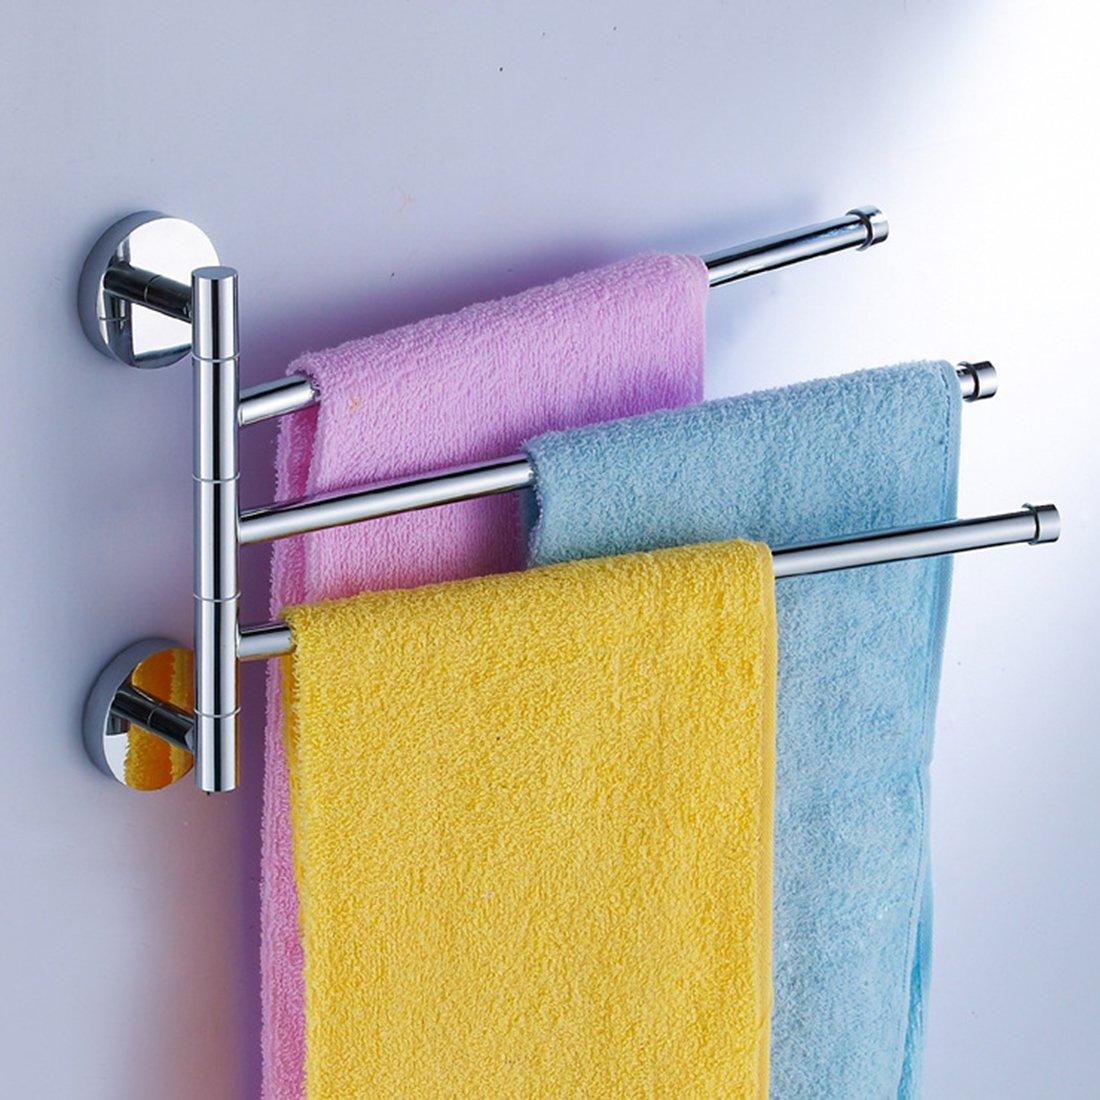 *200 W mm Hipsteen Badezimmer Wand-360 Grad Rotierende 3-Armig Handtuch Halter Rack Hanger 300 L